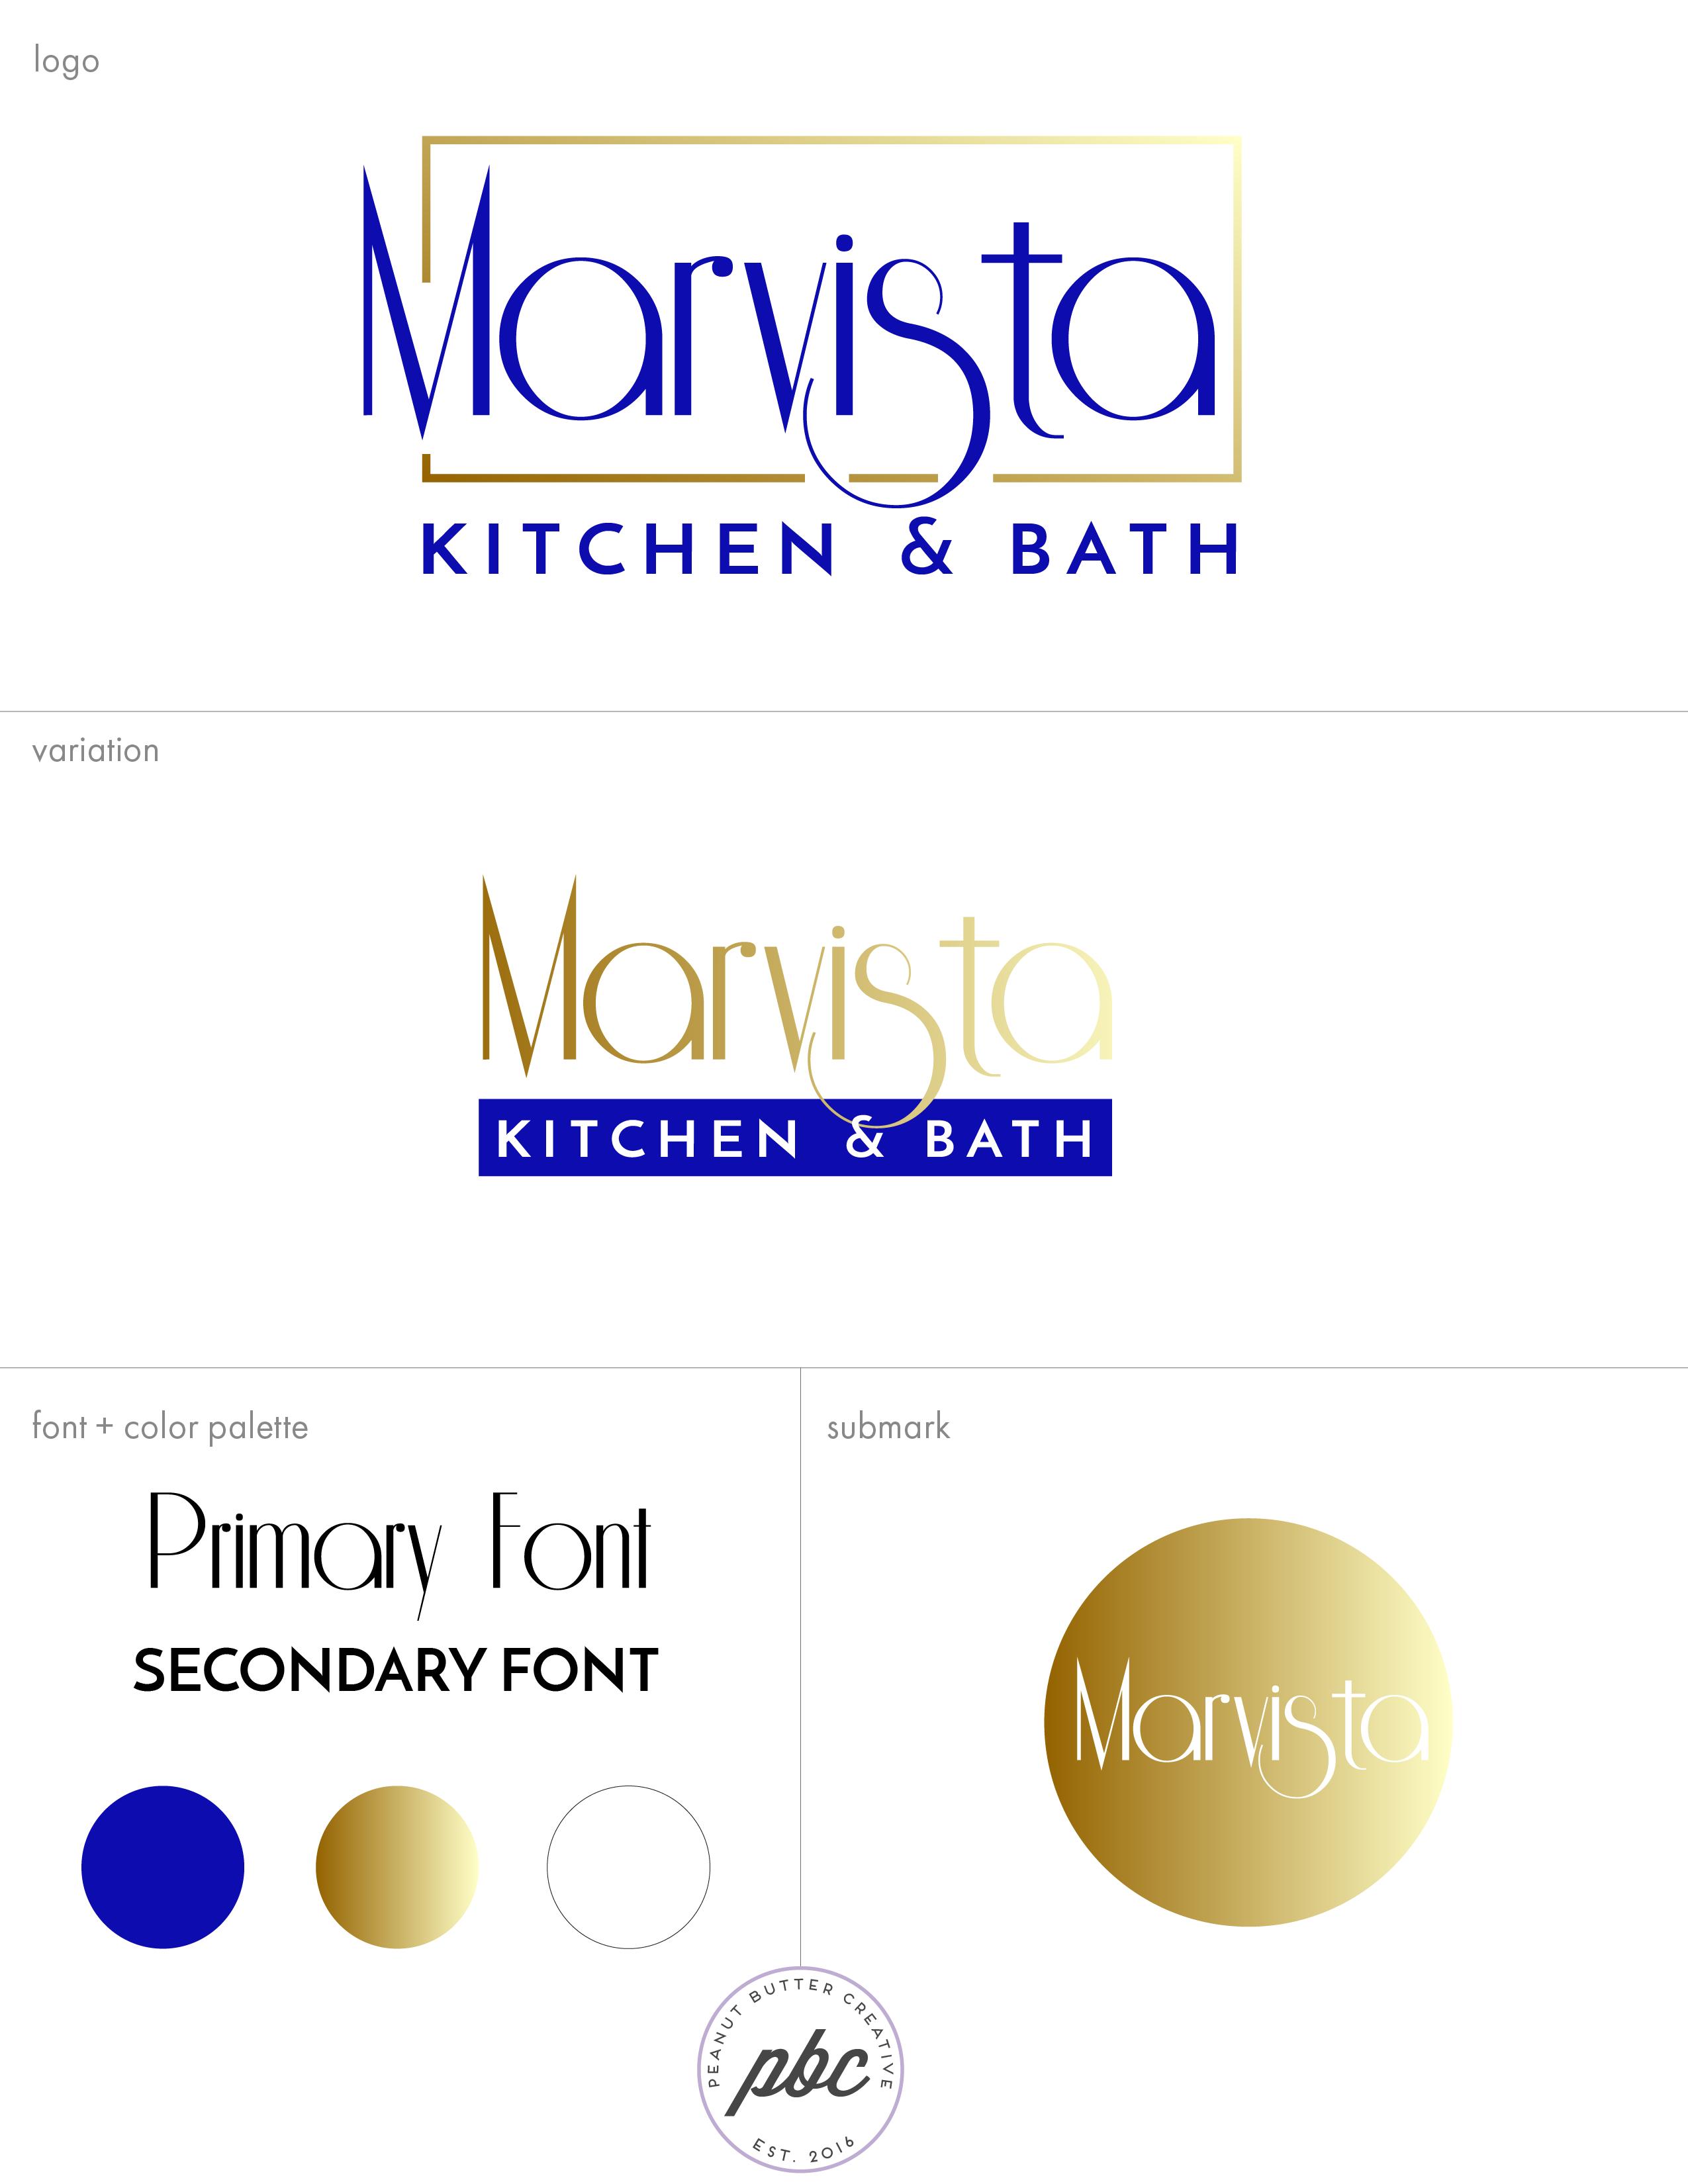 remodel logos